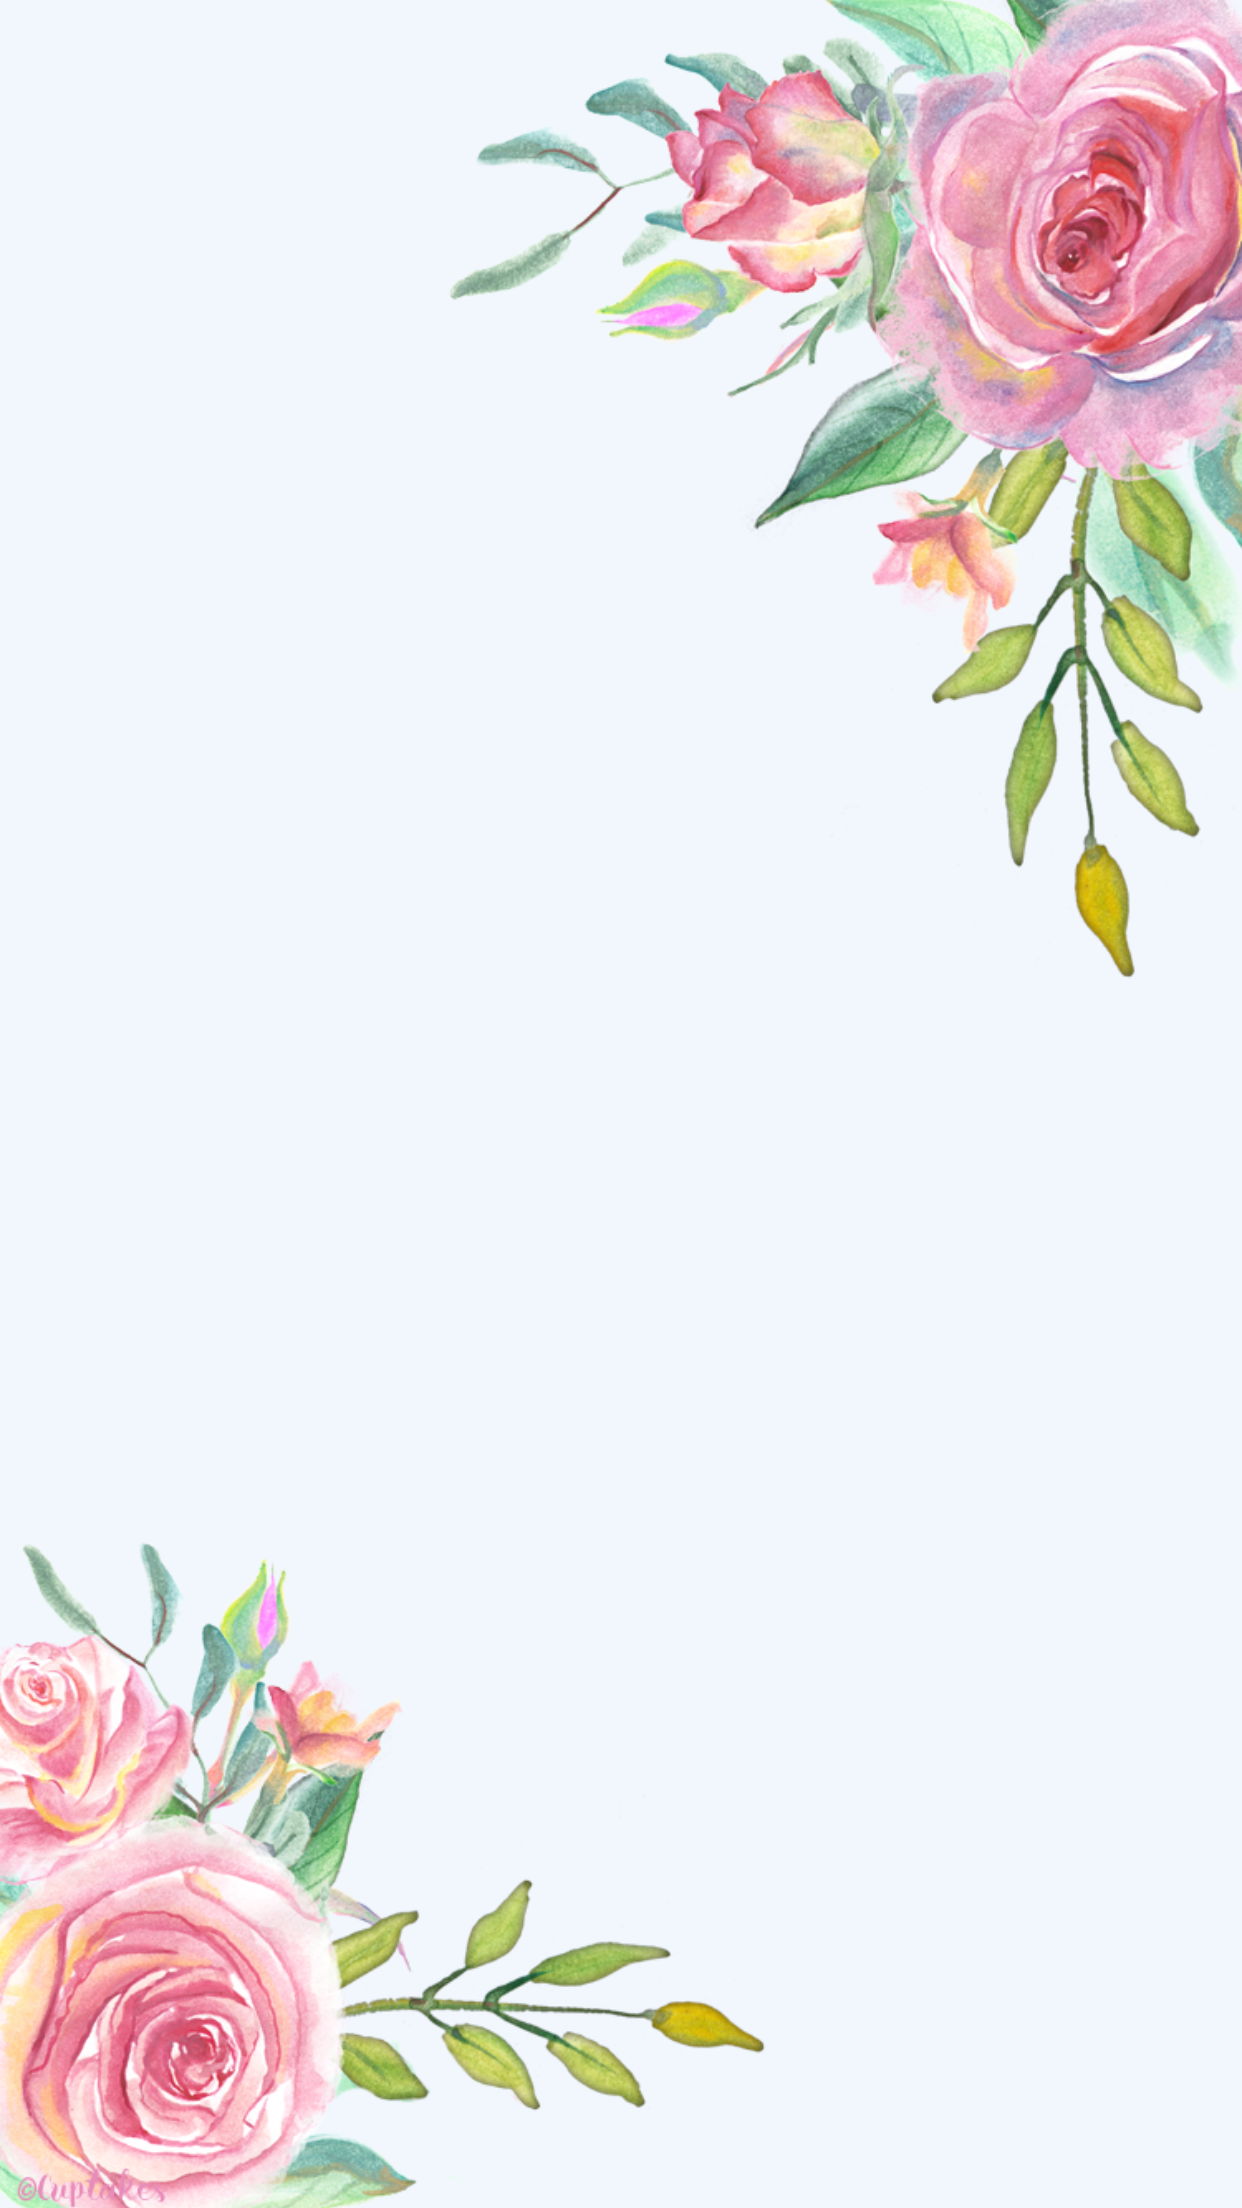 Tarjetas De Presentacion Backgrounds Pinterest Wallpaper